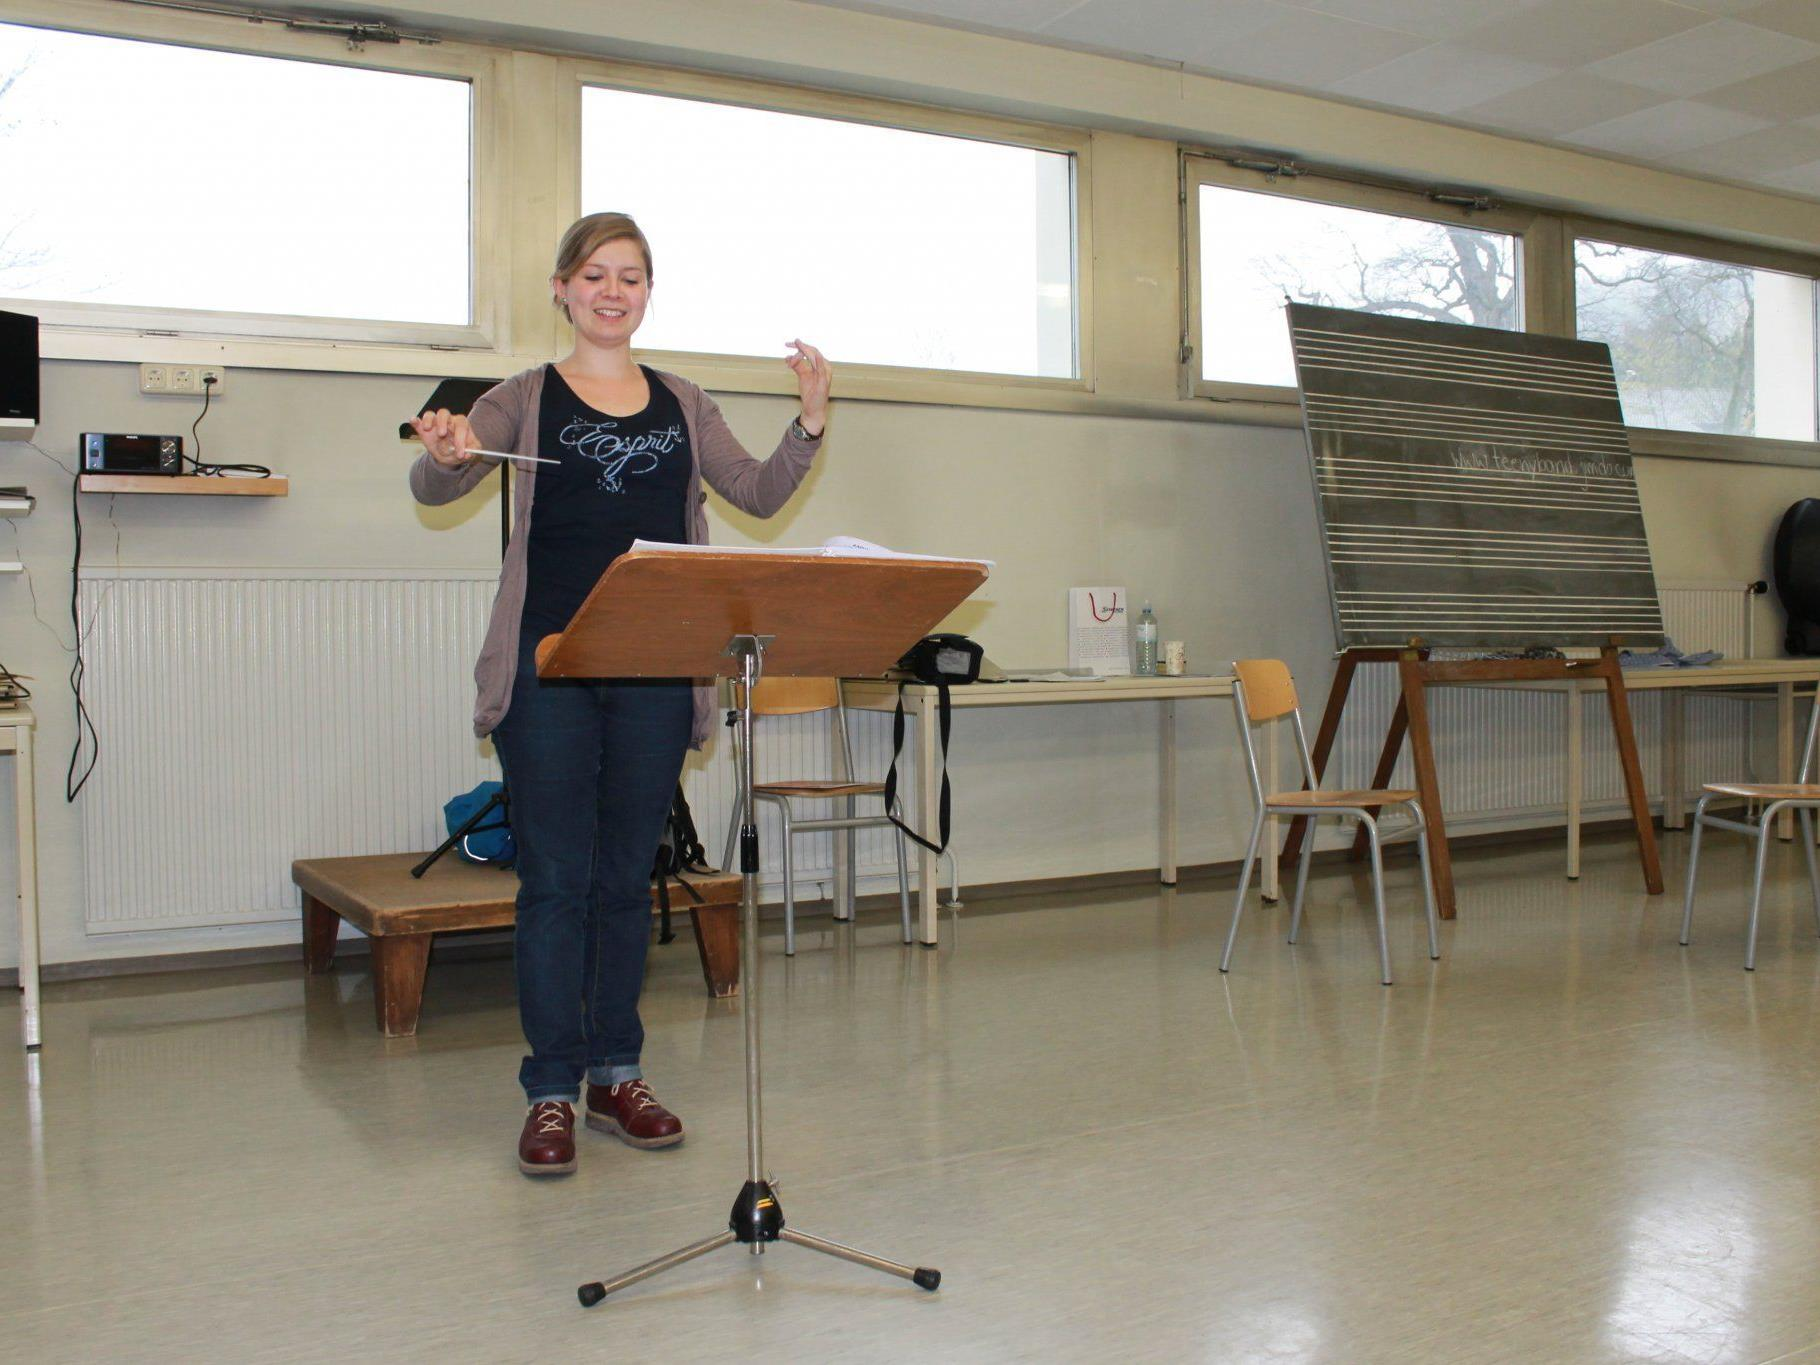 Johanna Müller dirigiert als Kapellmeisterin die Harmoniemusik Tisis-Tosters.